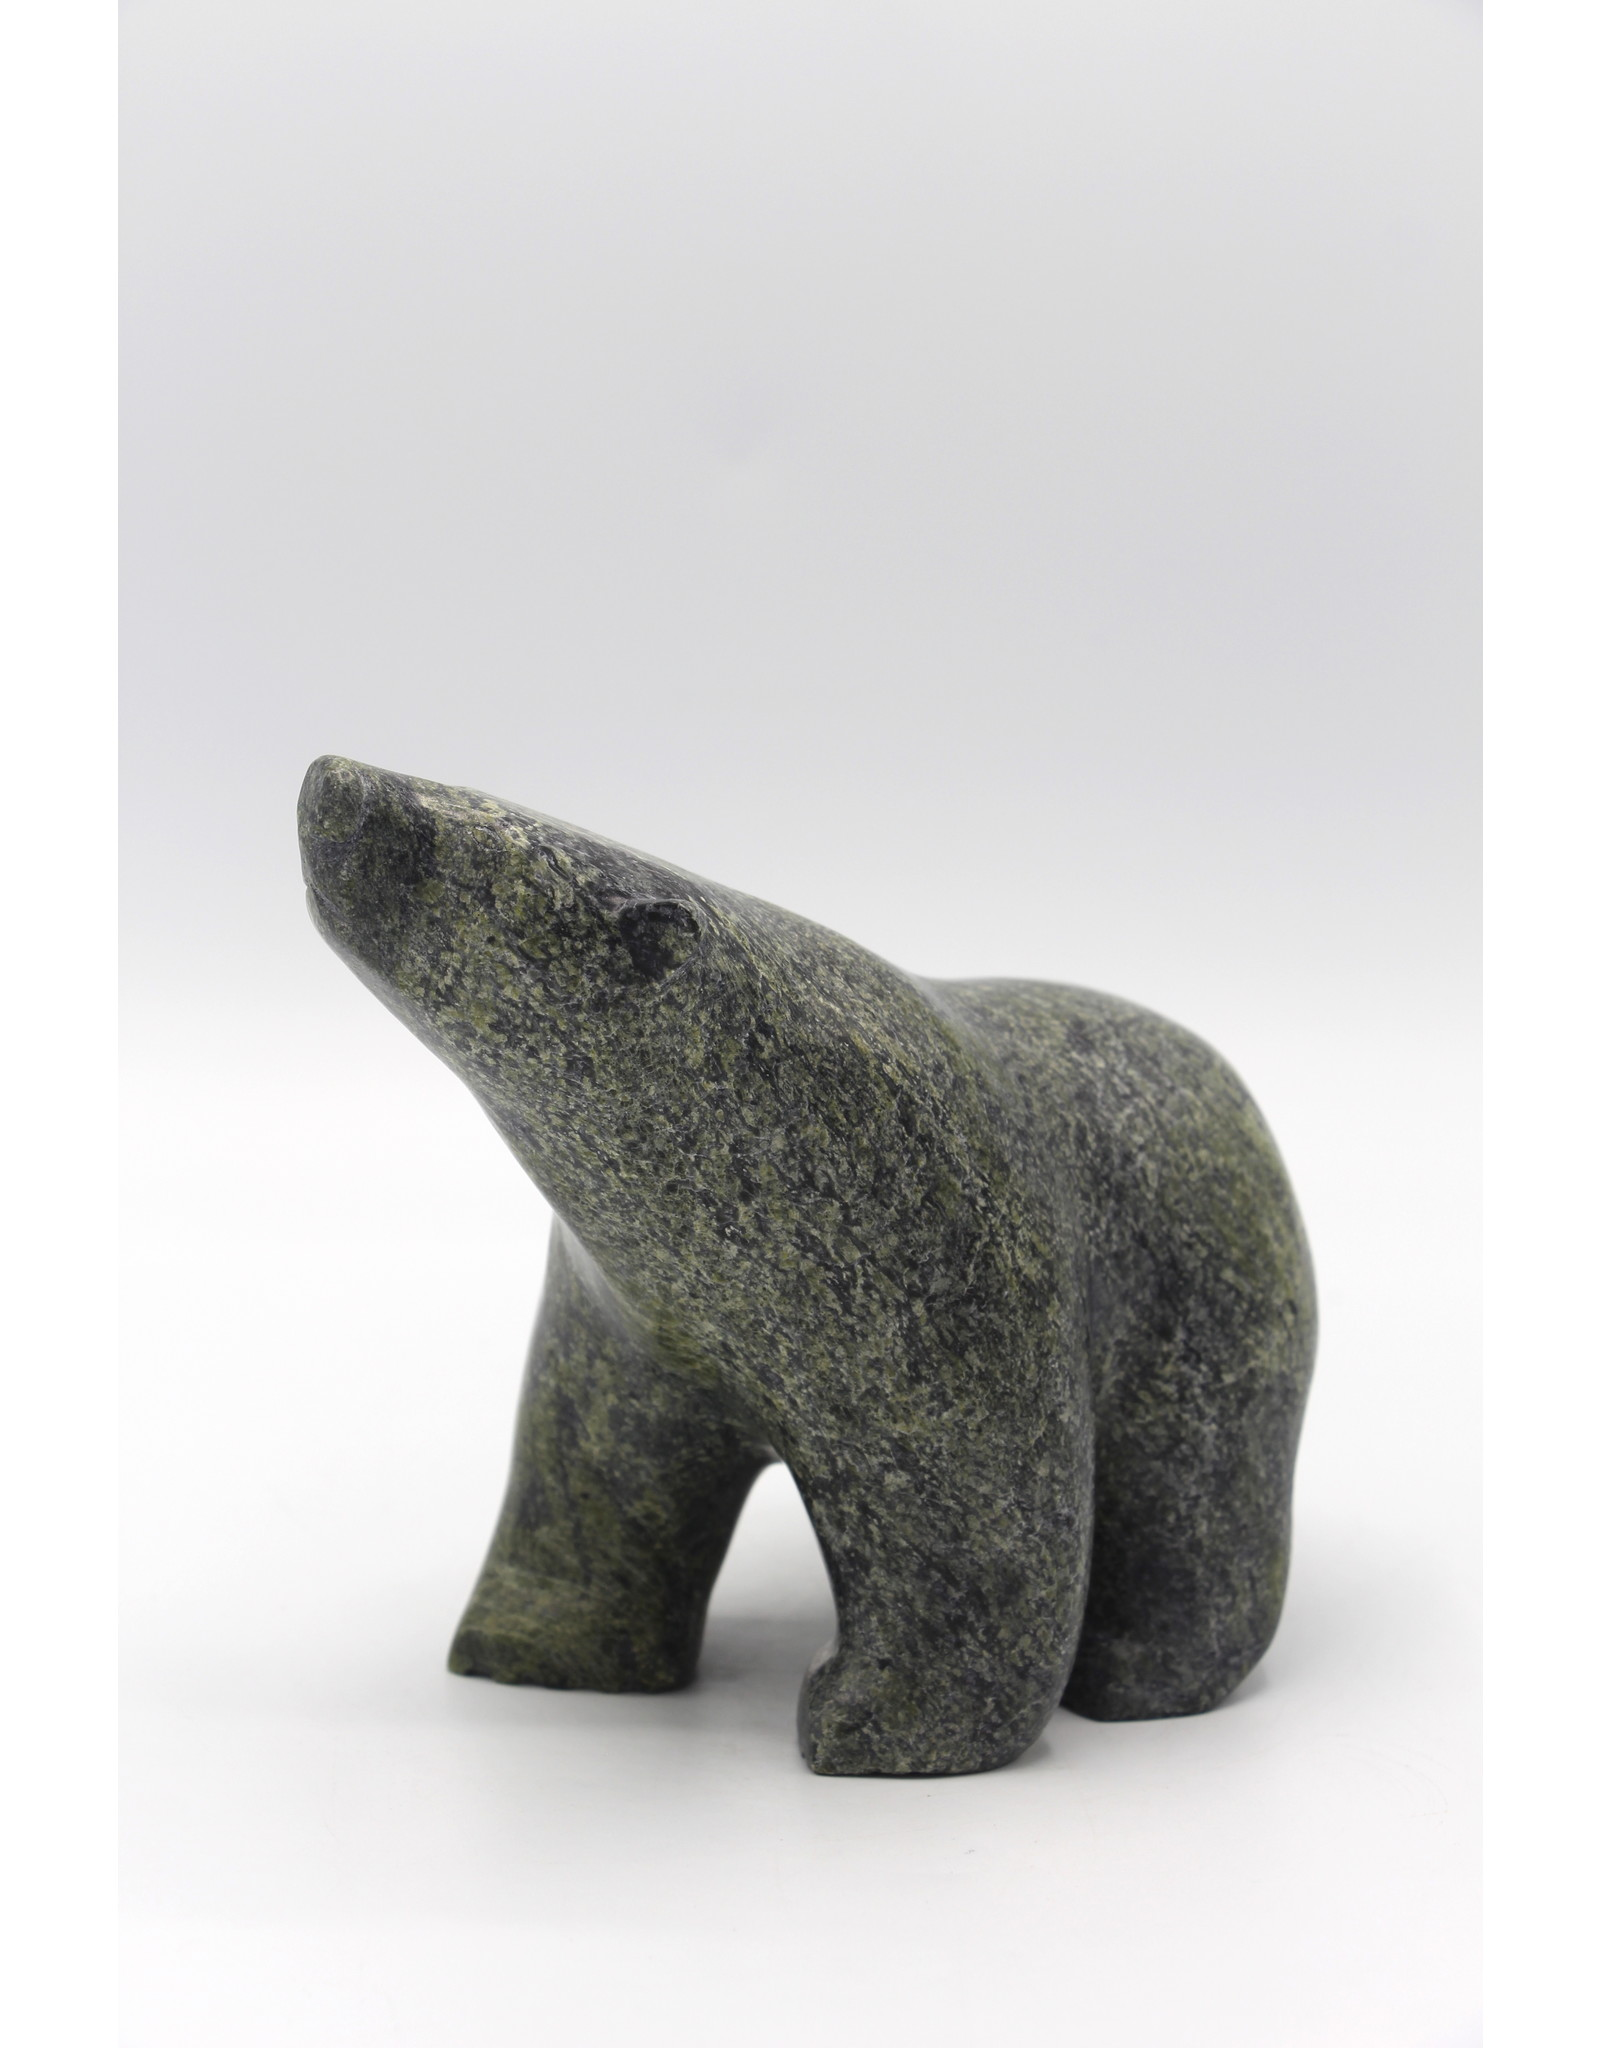 56077 Bear by Tony Oquitaq